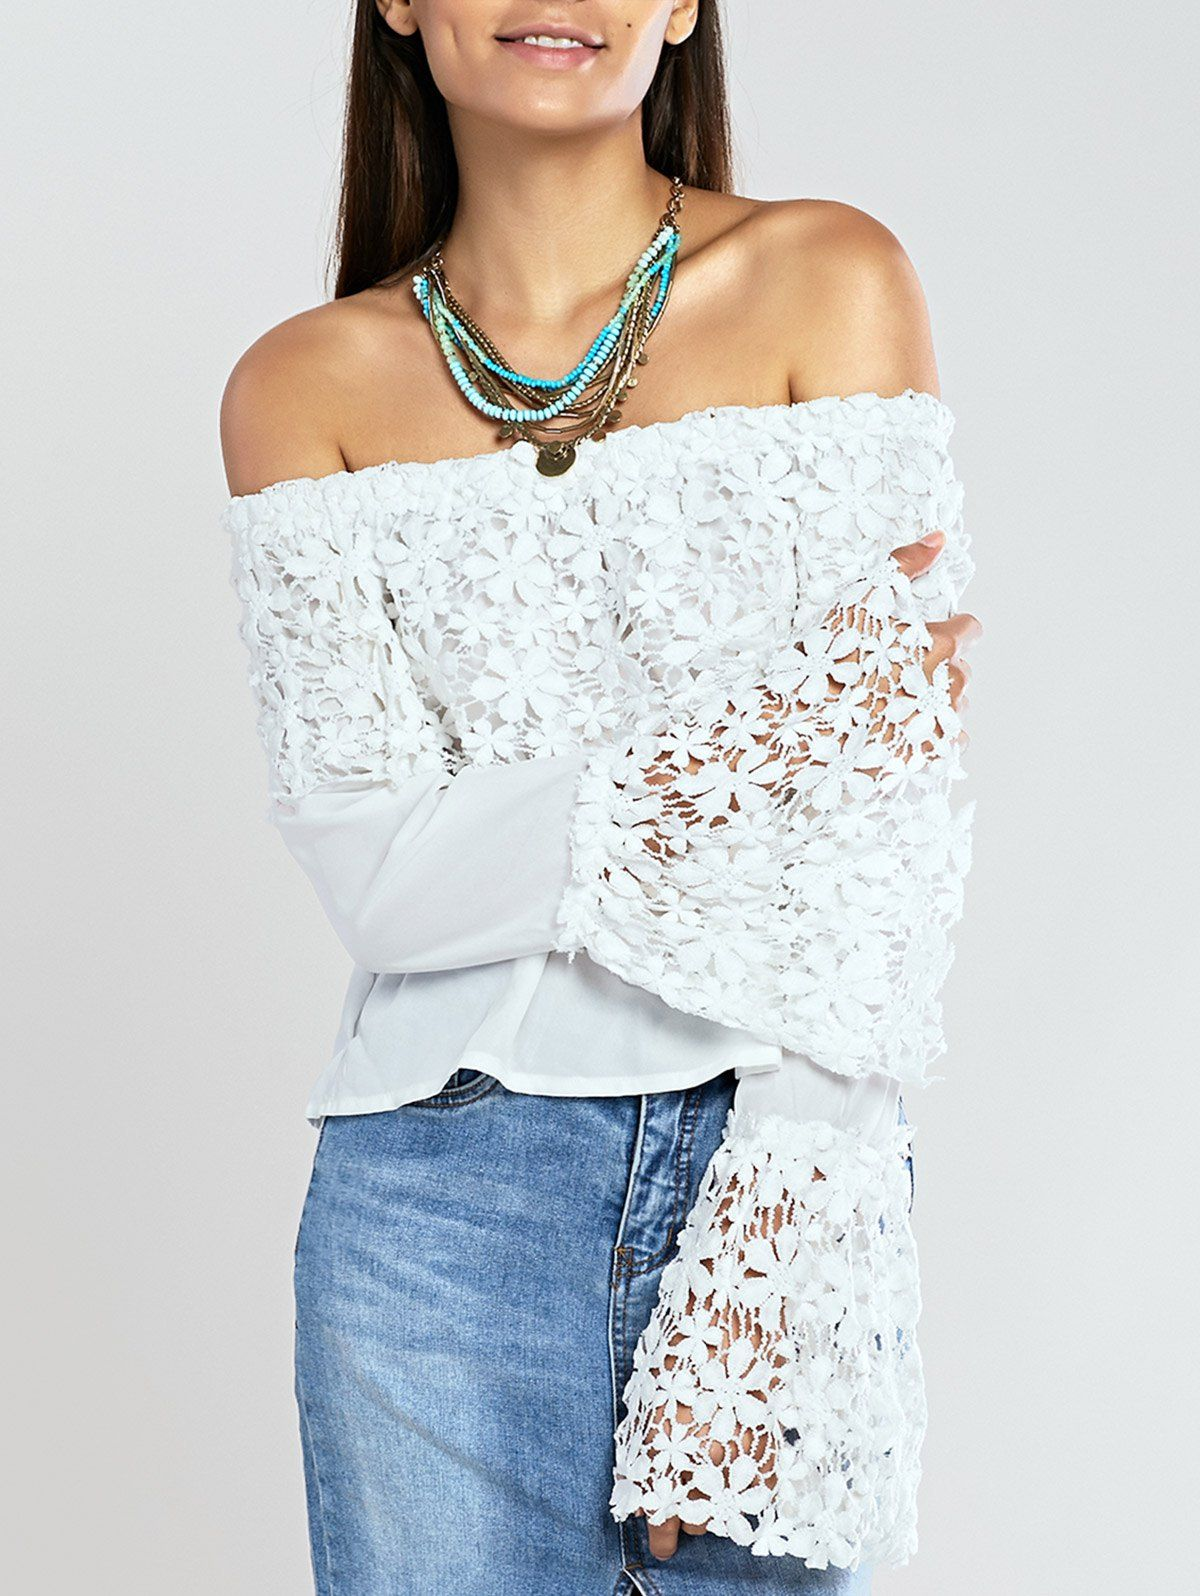 3d775f85a Sweet Crochet Off The Shoulder Lace Trim Bell Sleeve Blouse | Blusa  ciganinha branca com renda guipir LINDA! #dress #fashion #modafeminina  #vestido ...